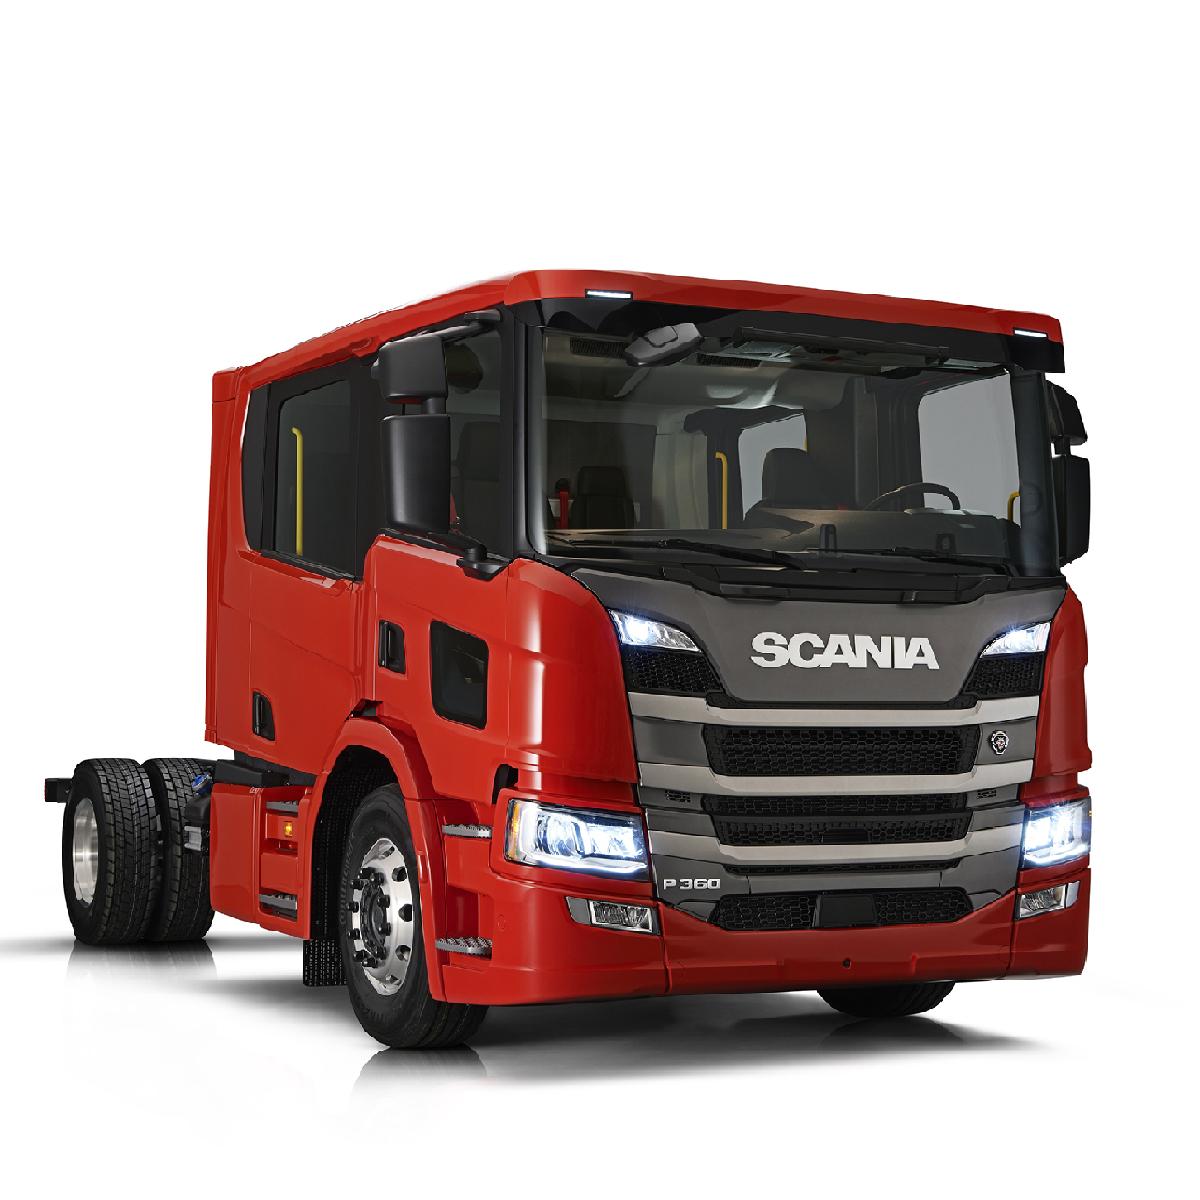 Truck Cab Sizes >> New Scania CrewCab–a world class crew cab | Scania Global